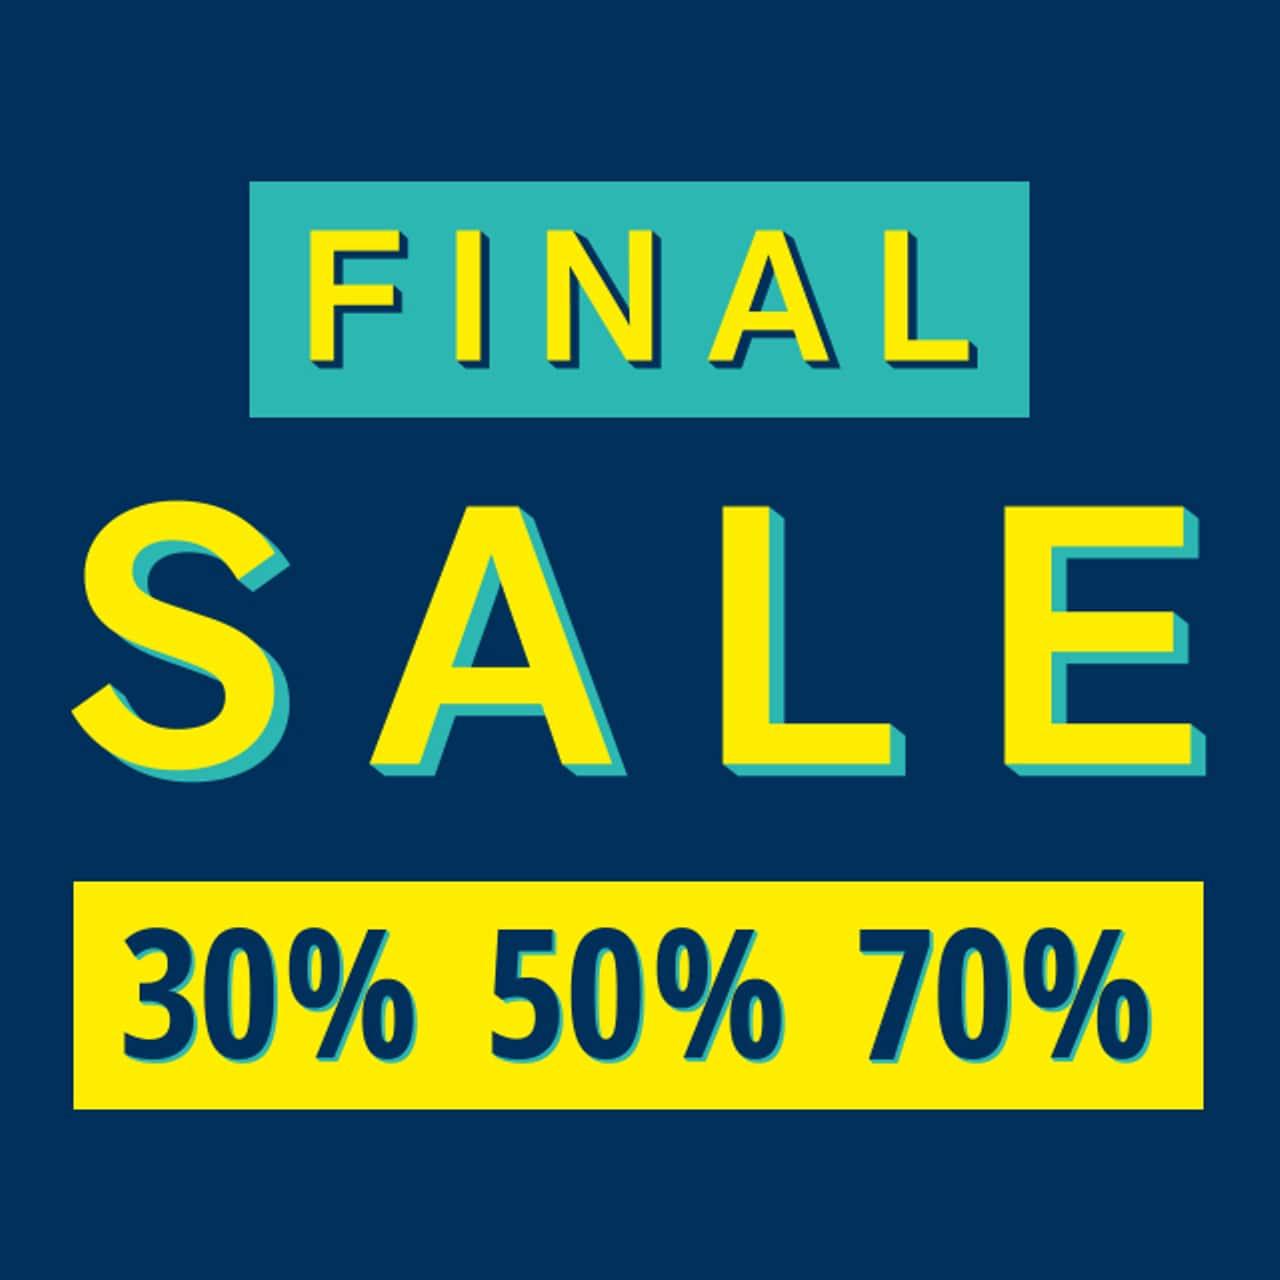 Peek & Cloppenburg: FINAL SALE 30% 50% 70%